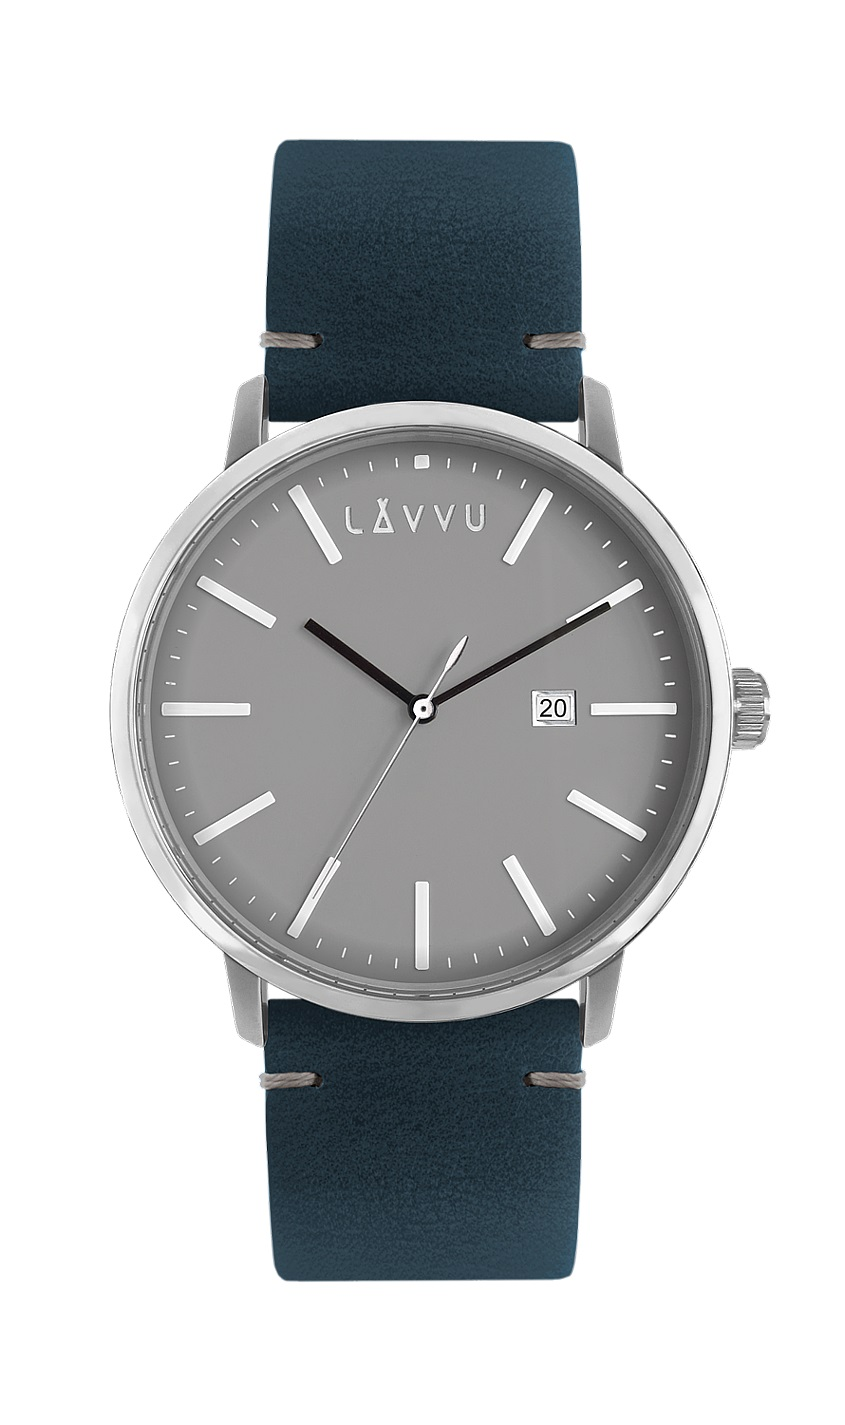 Šedo-modré pánské hodinky LAVVU COPENHAGEN NIGHTS s koženým páskem LWM0032 (POŠTOVNÉ ZDARMA!!! LWM0032)